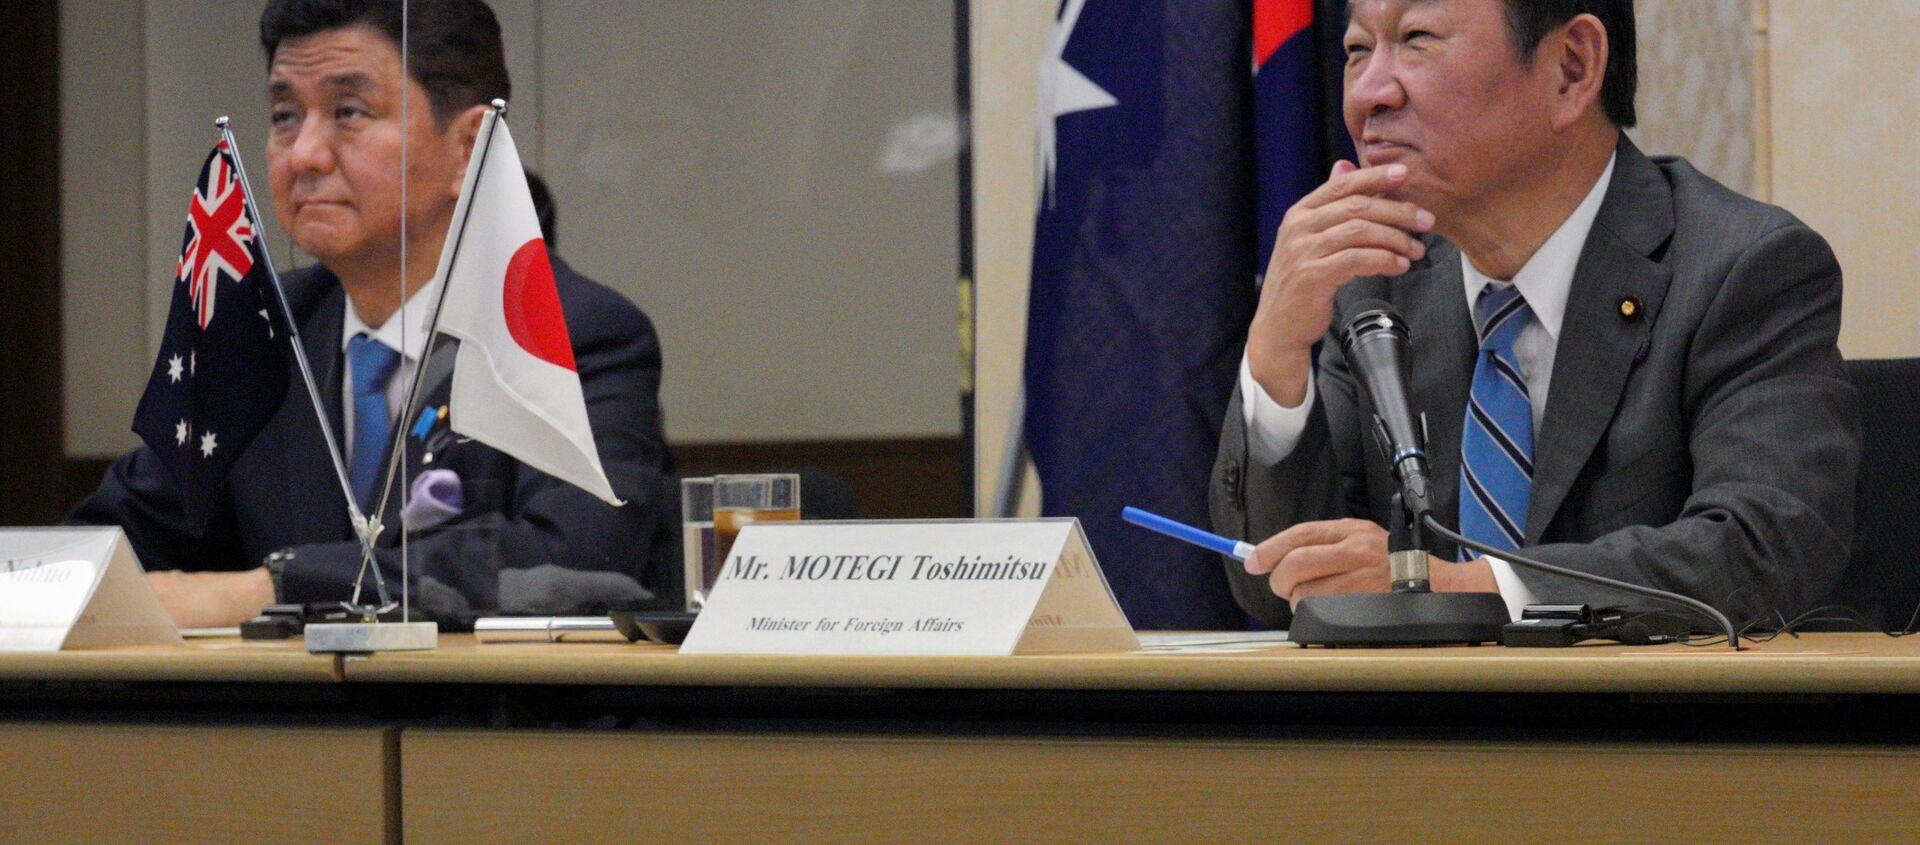 Глава МИД Японии Тосимицу Мотэги и министр обороны Нобуо Киси во время саммита 2 plus 2 с австралийскими коллегами в Токио - Sputnik 日本, 1920, 12.06.2021